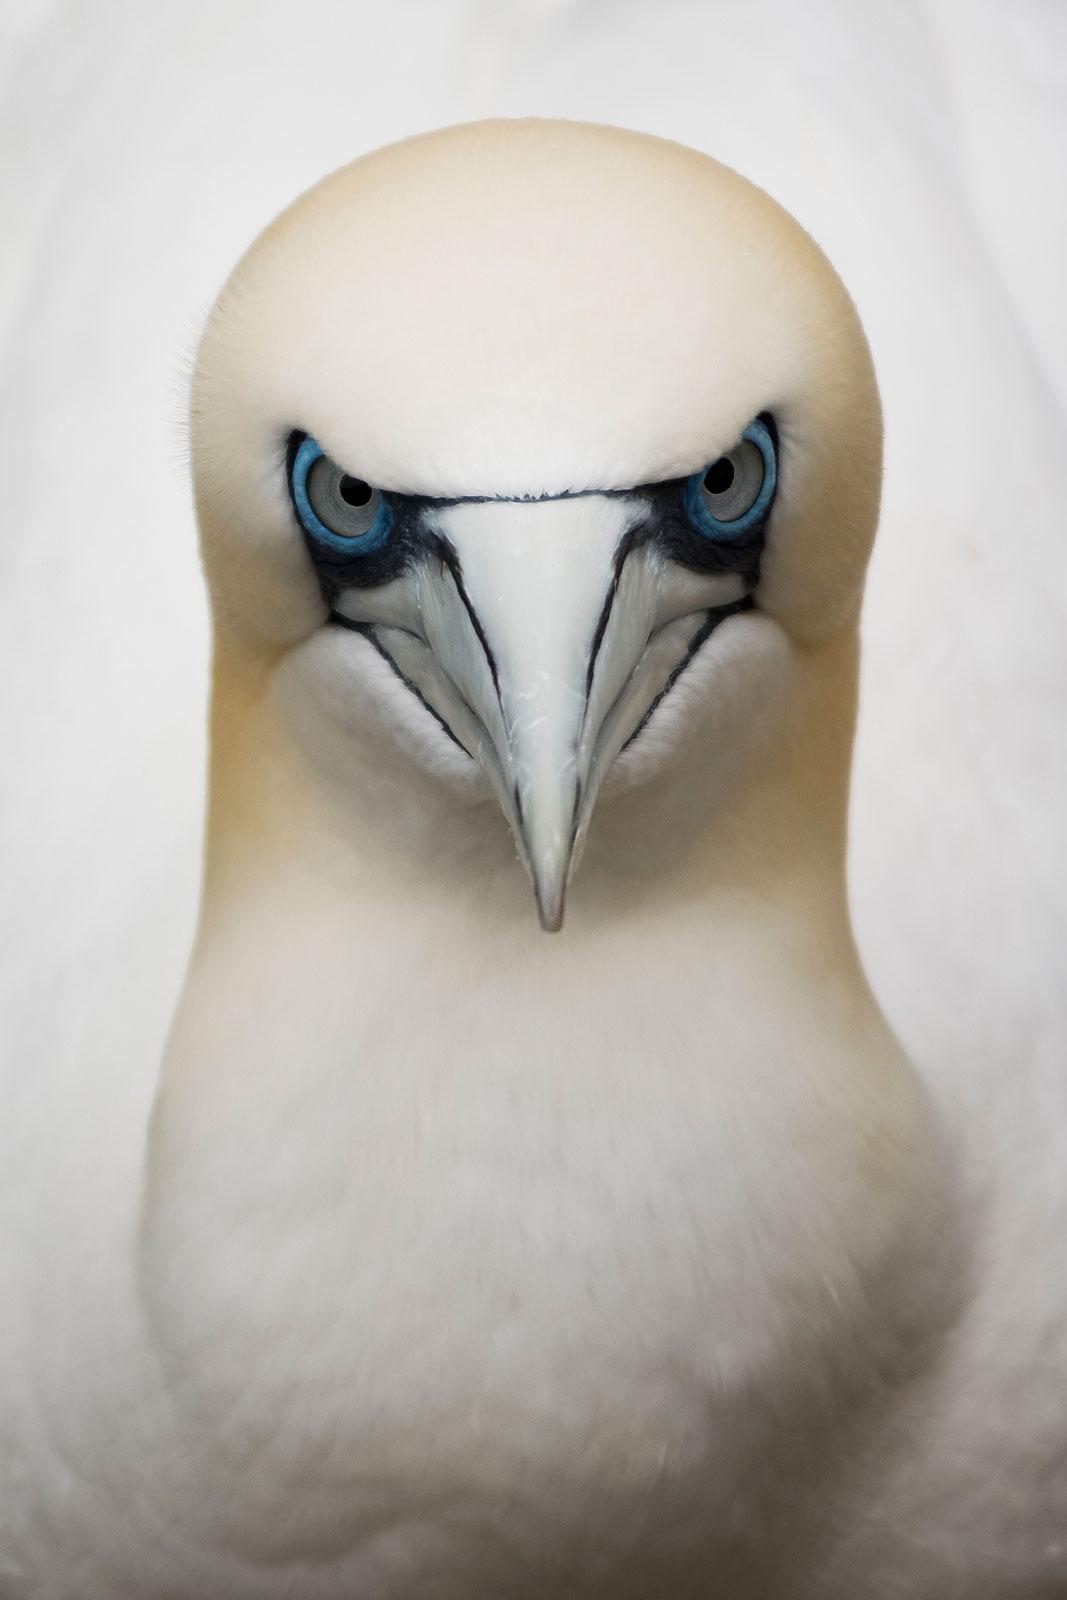 foto: © Eugene Kitsios, Netherlands, Shortlist, Open Competition, Wildlife, 2017 Sony World Photography Awards - Eye to eye